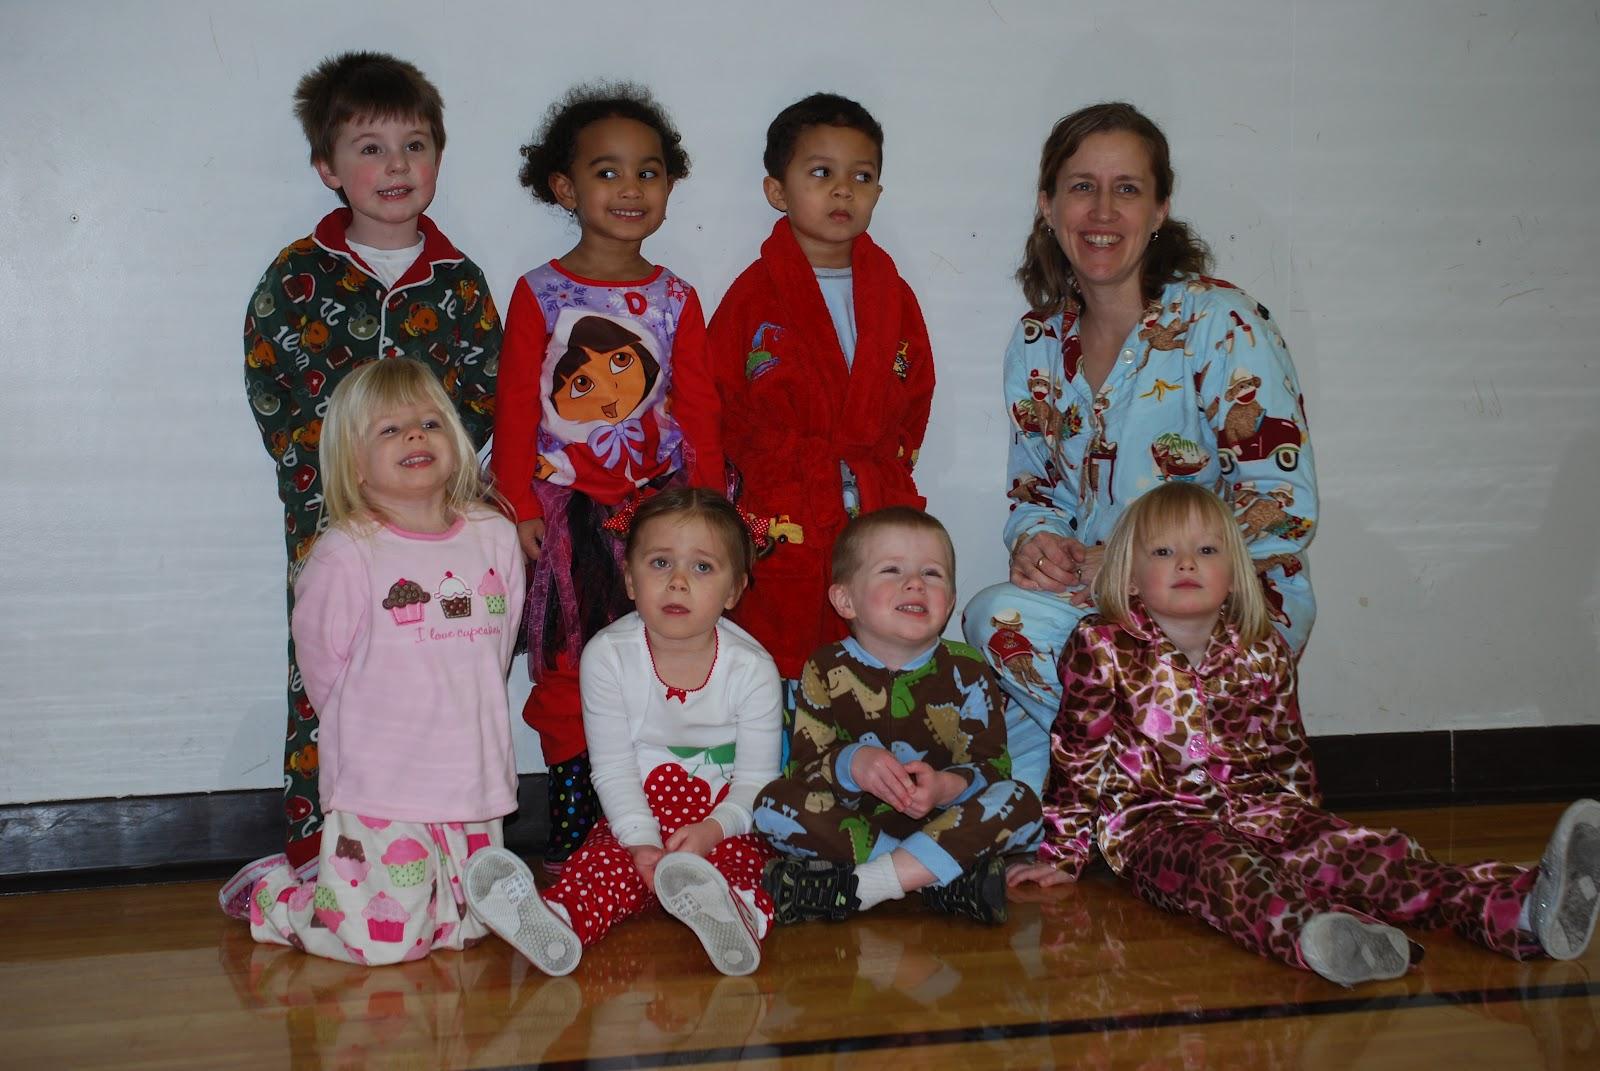 The Phelan Family Preschool Pajama Day